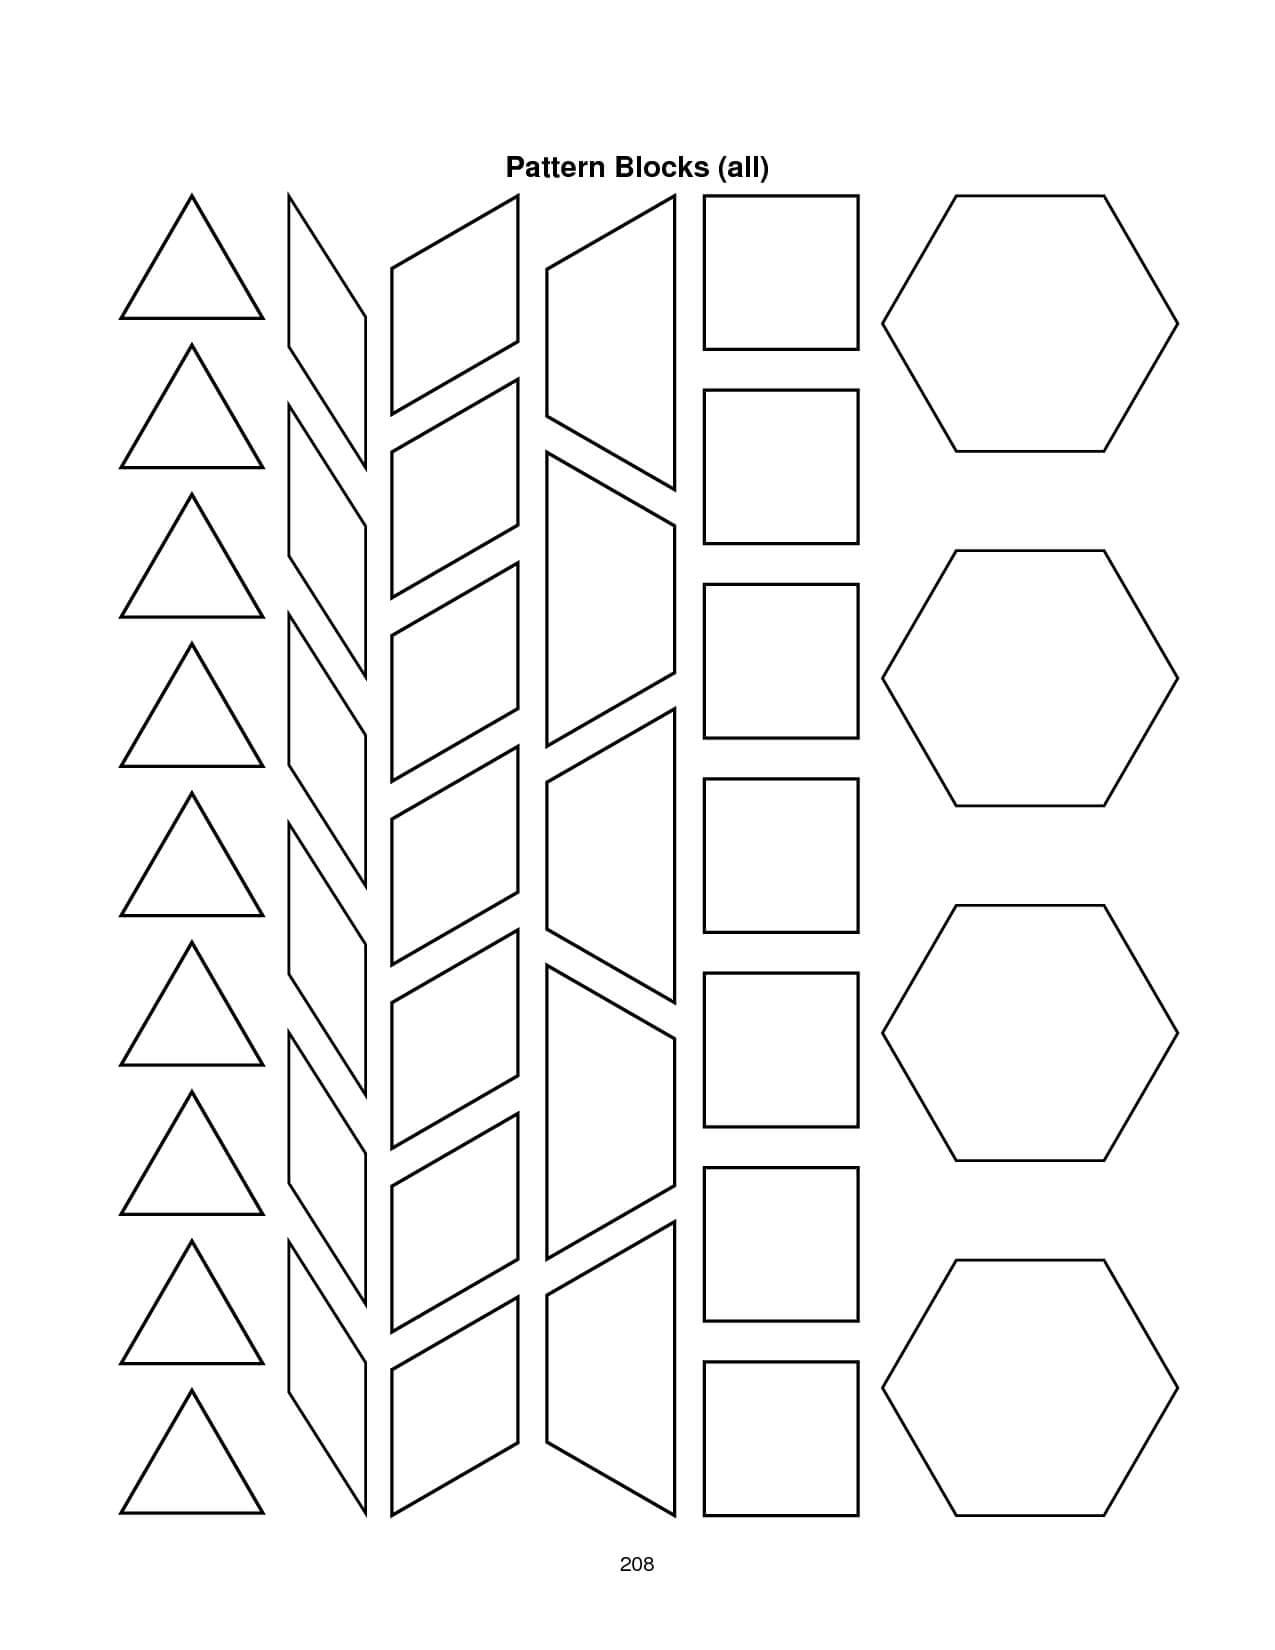 28 Images Of Blank Alphabet Pattern Block Template | Migapps With Blank Pattern Block Templates